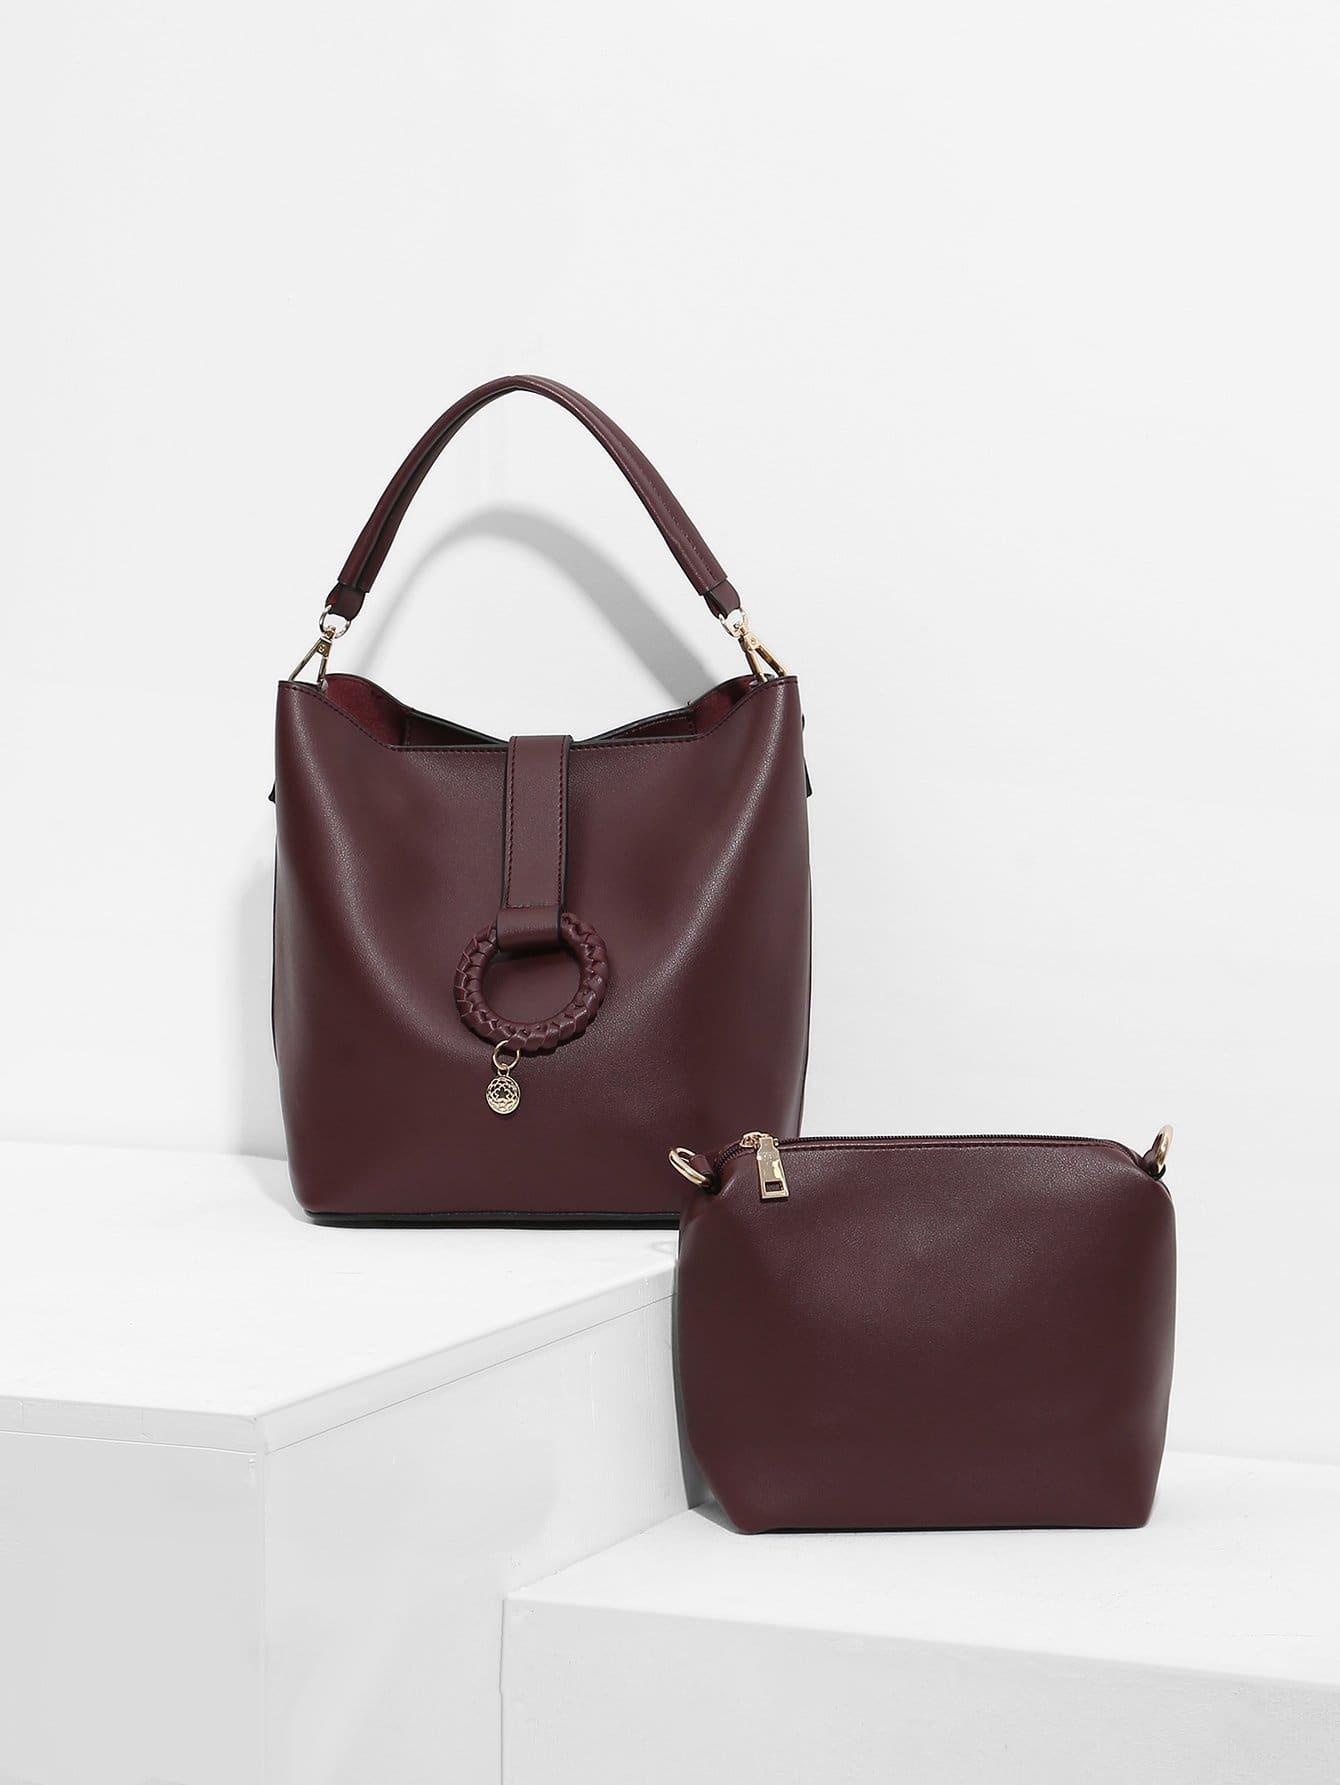 PU Shoulder Bag With Convertible Strap arte lamp потолочная люстра arte lamp dolcemente a1607pl 5ab